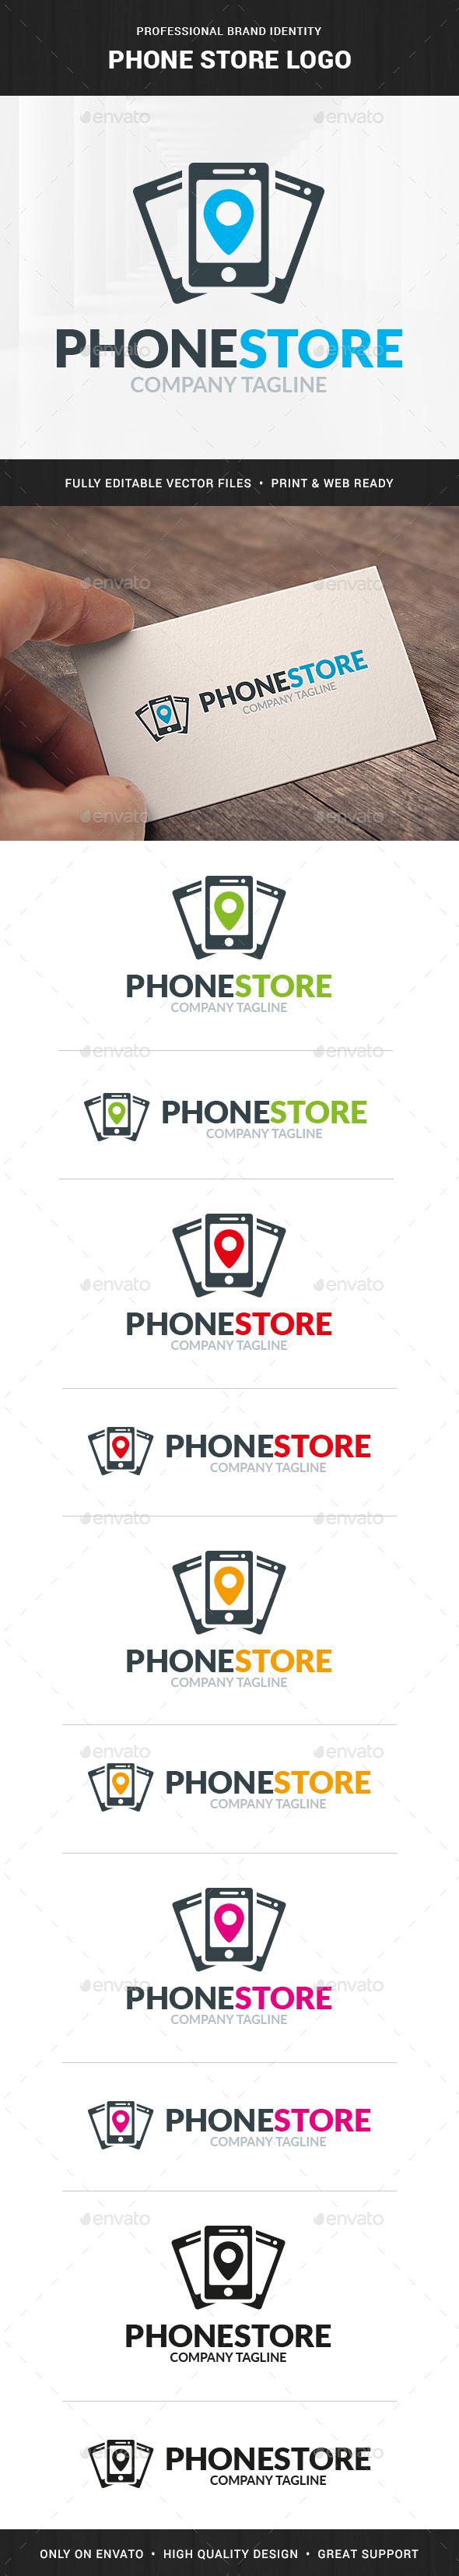 Phone Store Logo Template